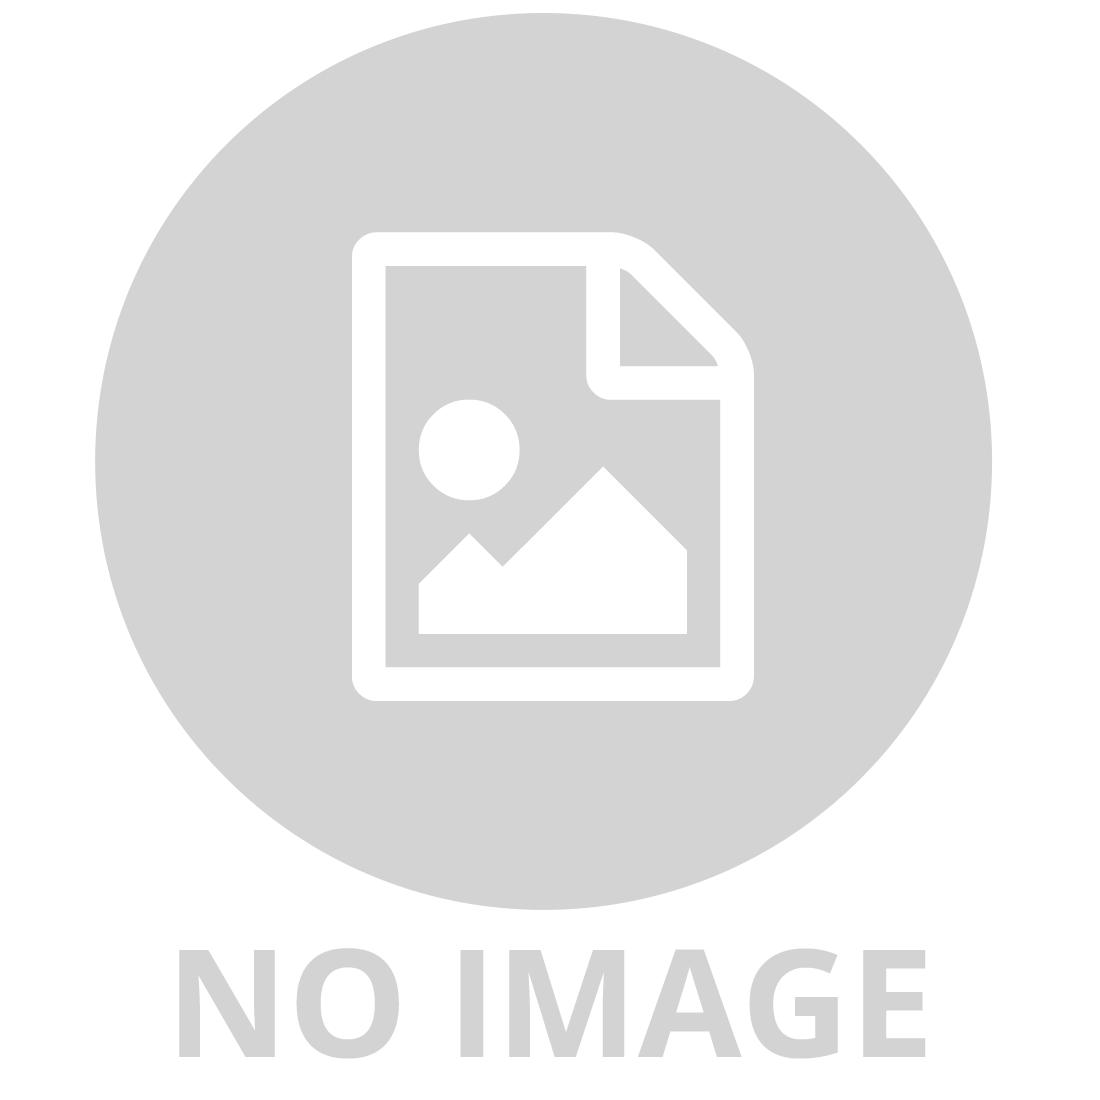 DISNEY PIXAR CARS CHARACTER CARS